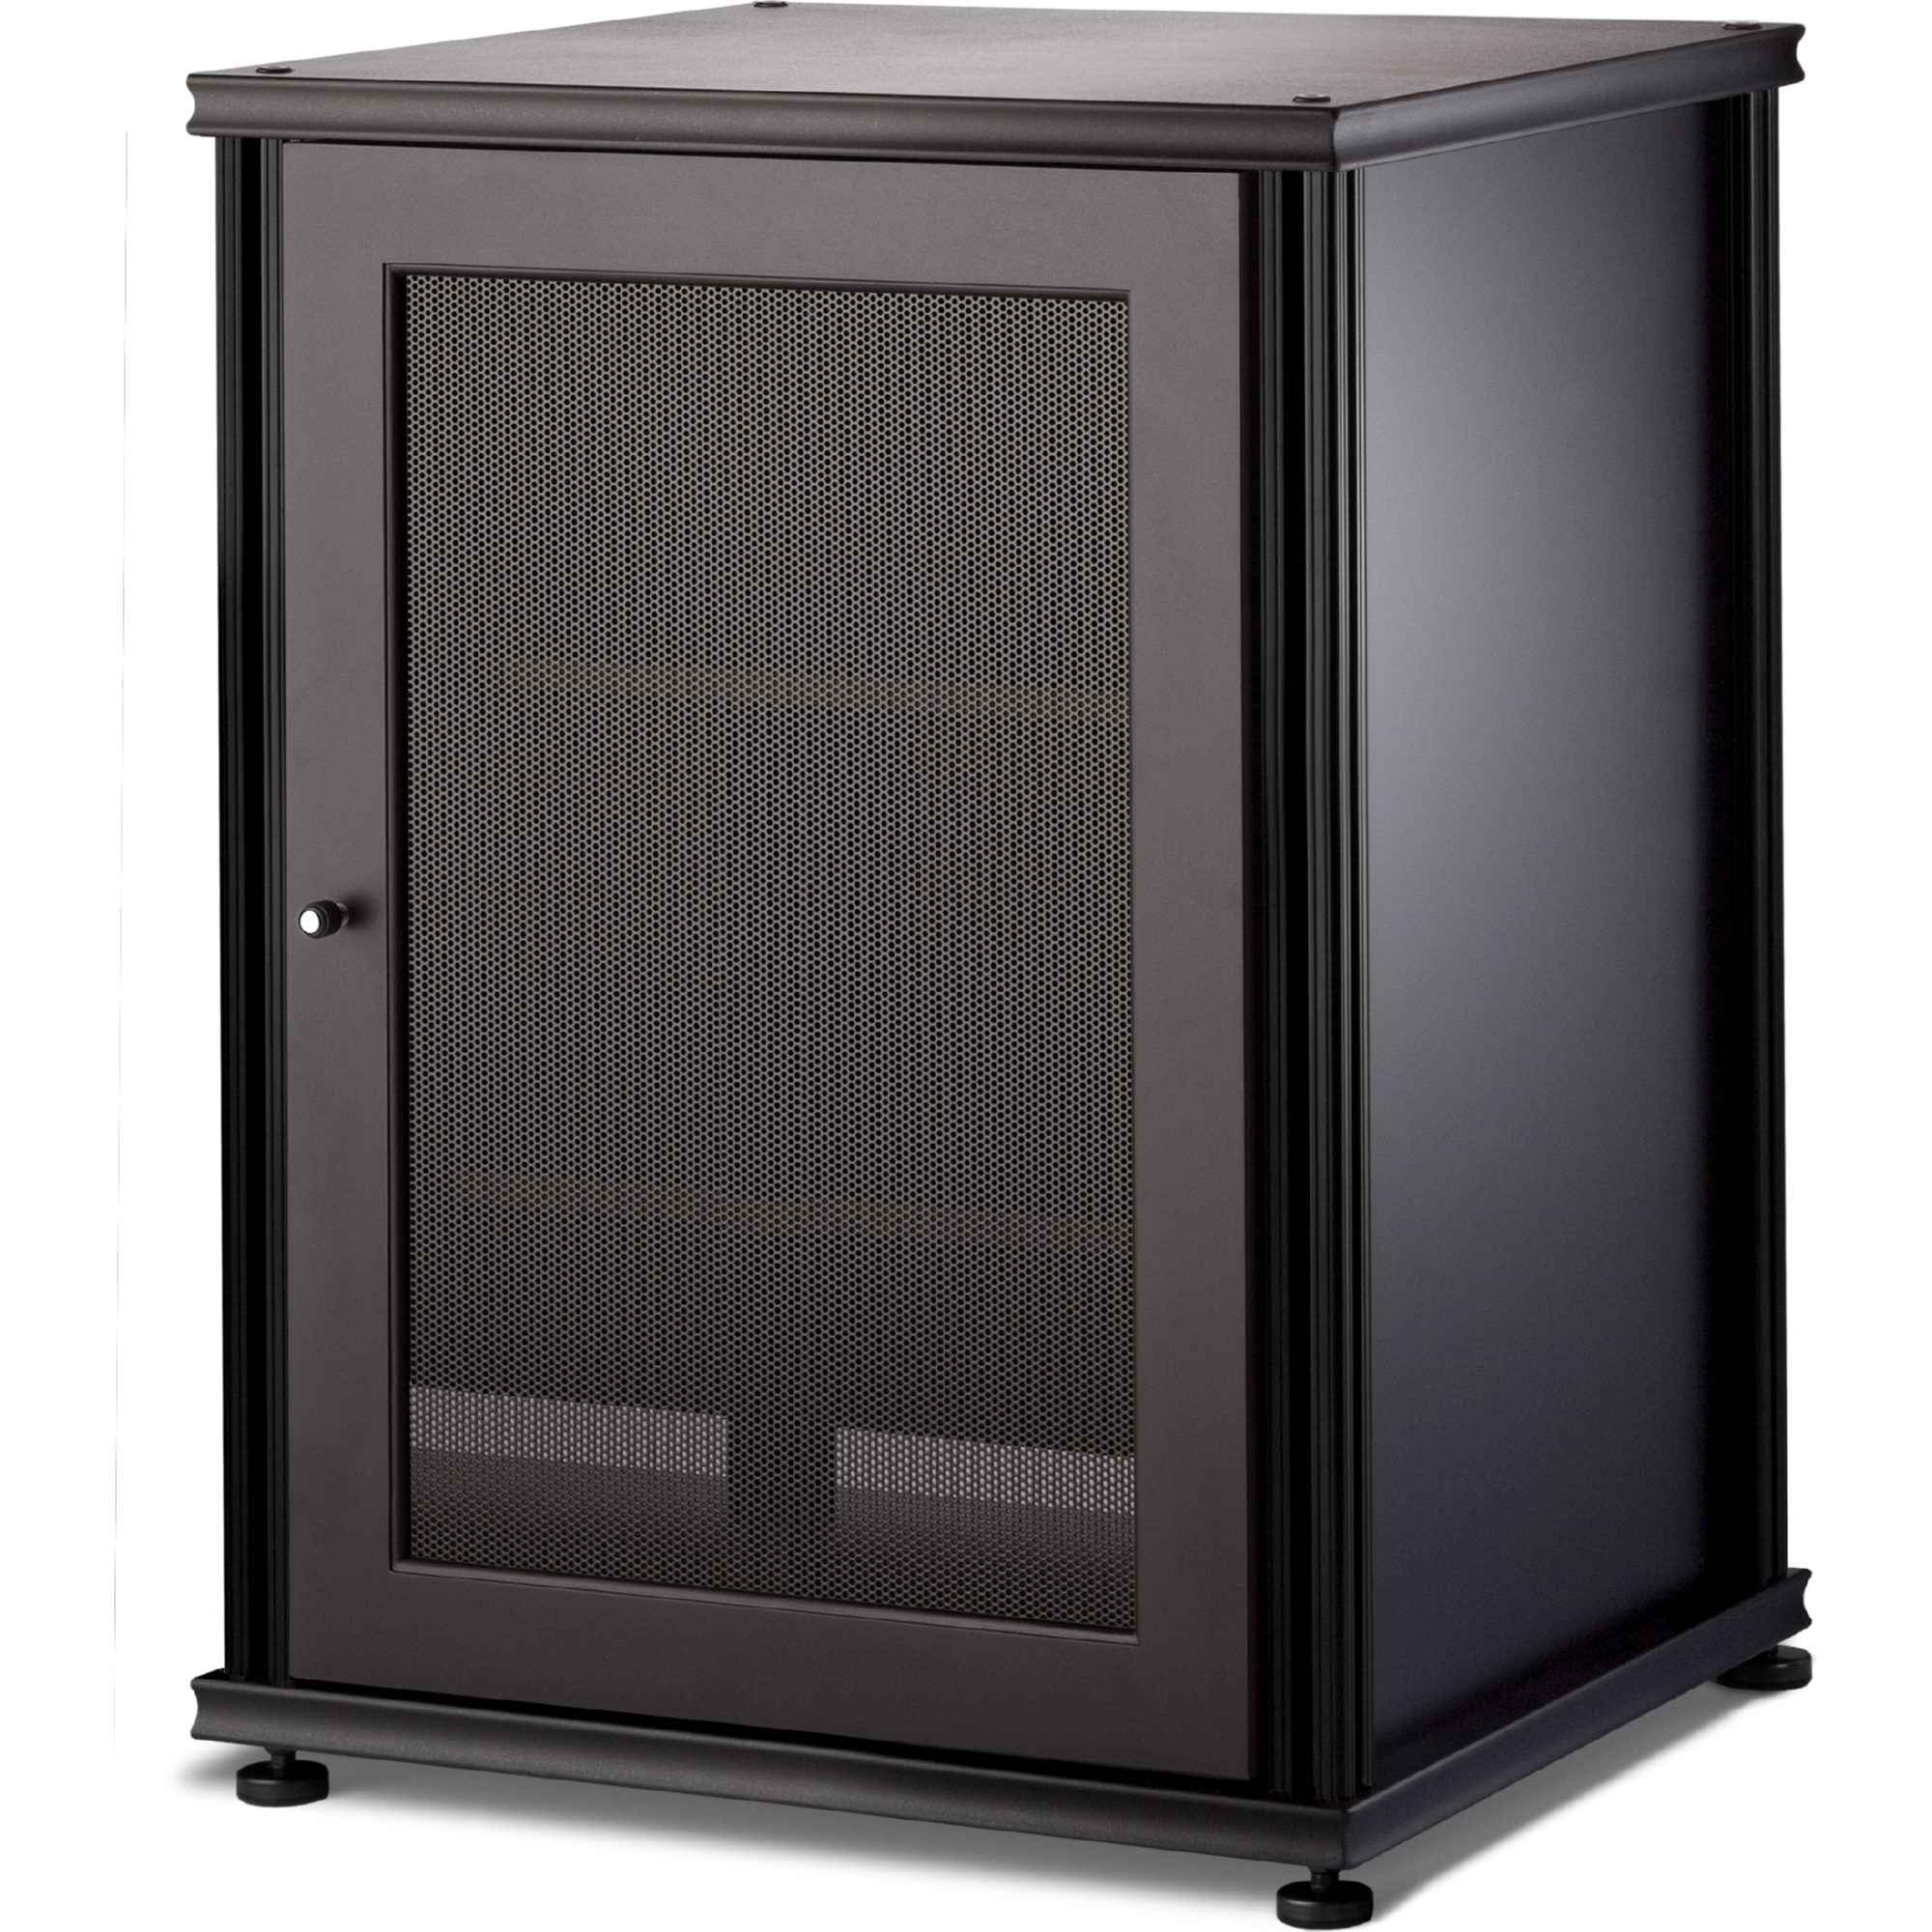 Salamander Designs Sb303b B Synergy System 303 Single Width Av Cabinet Audio Rack In Black W